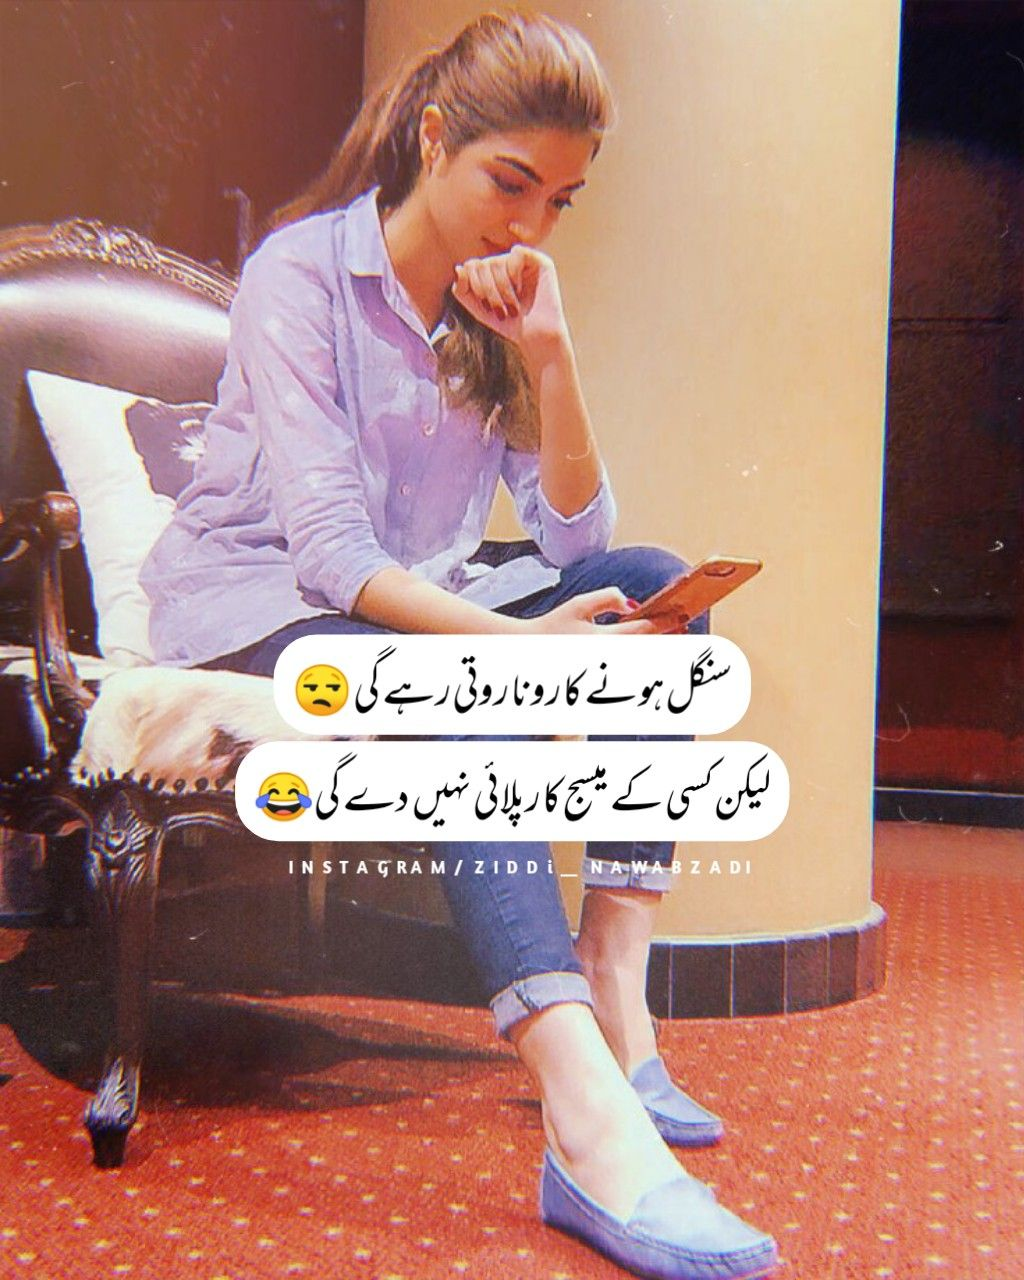 Pin by Iamhappy on NaWaBzaDî WrïTeS | Funny girl quotes